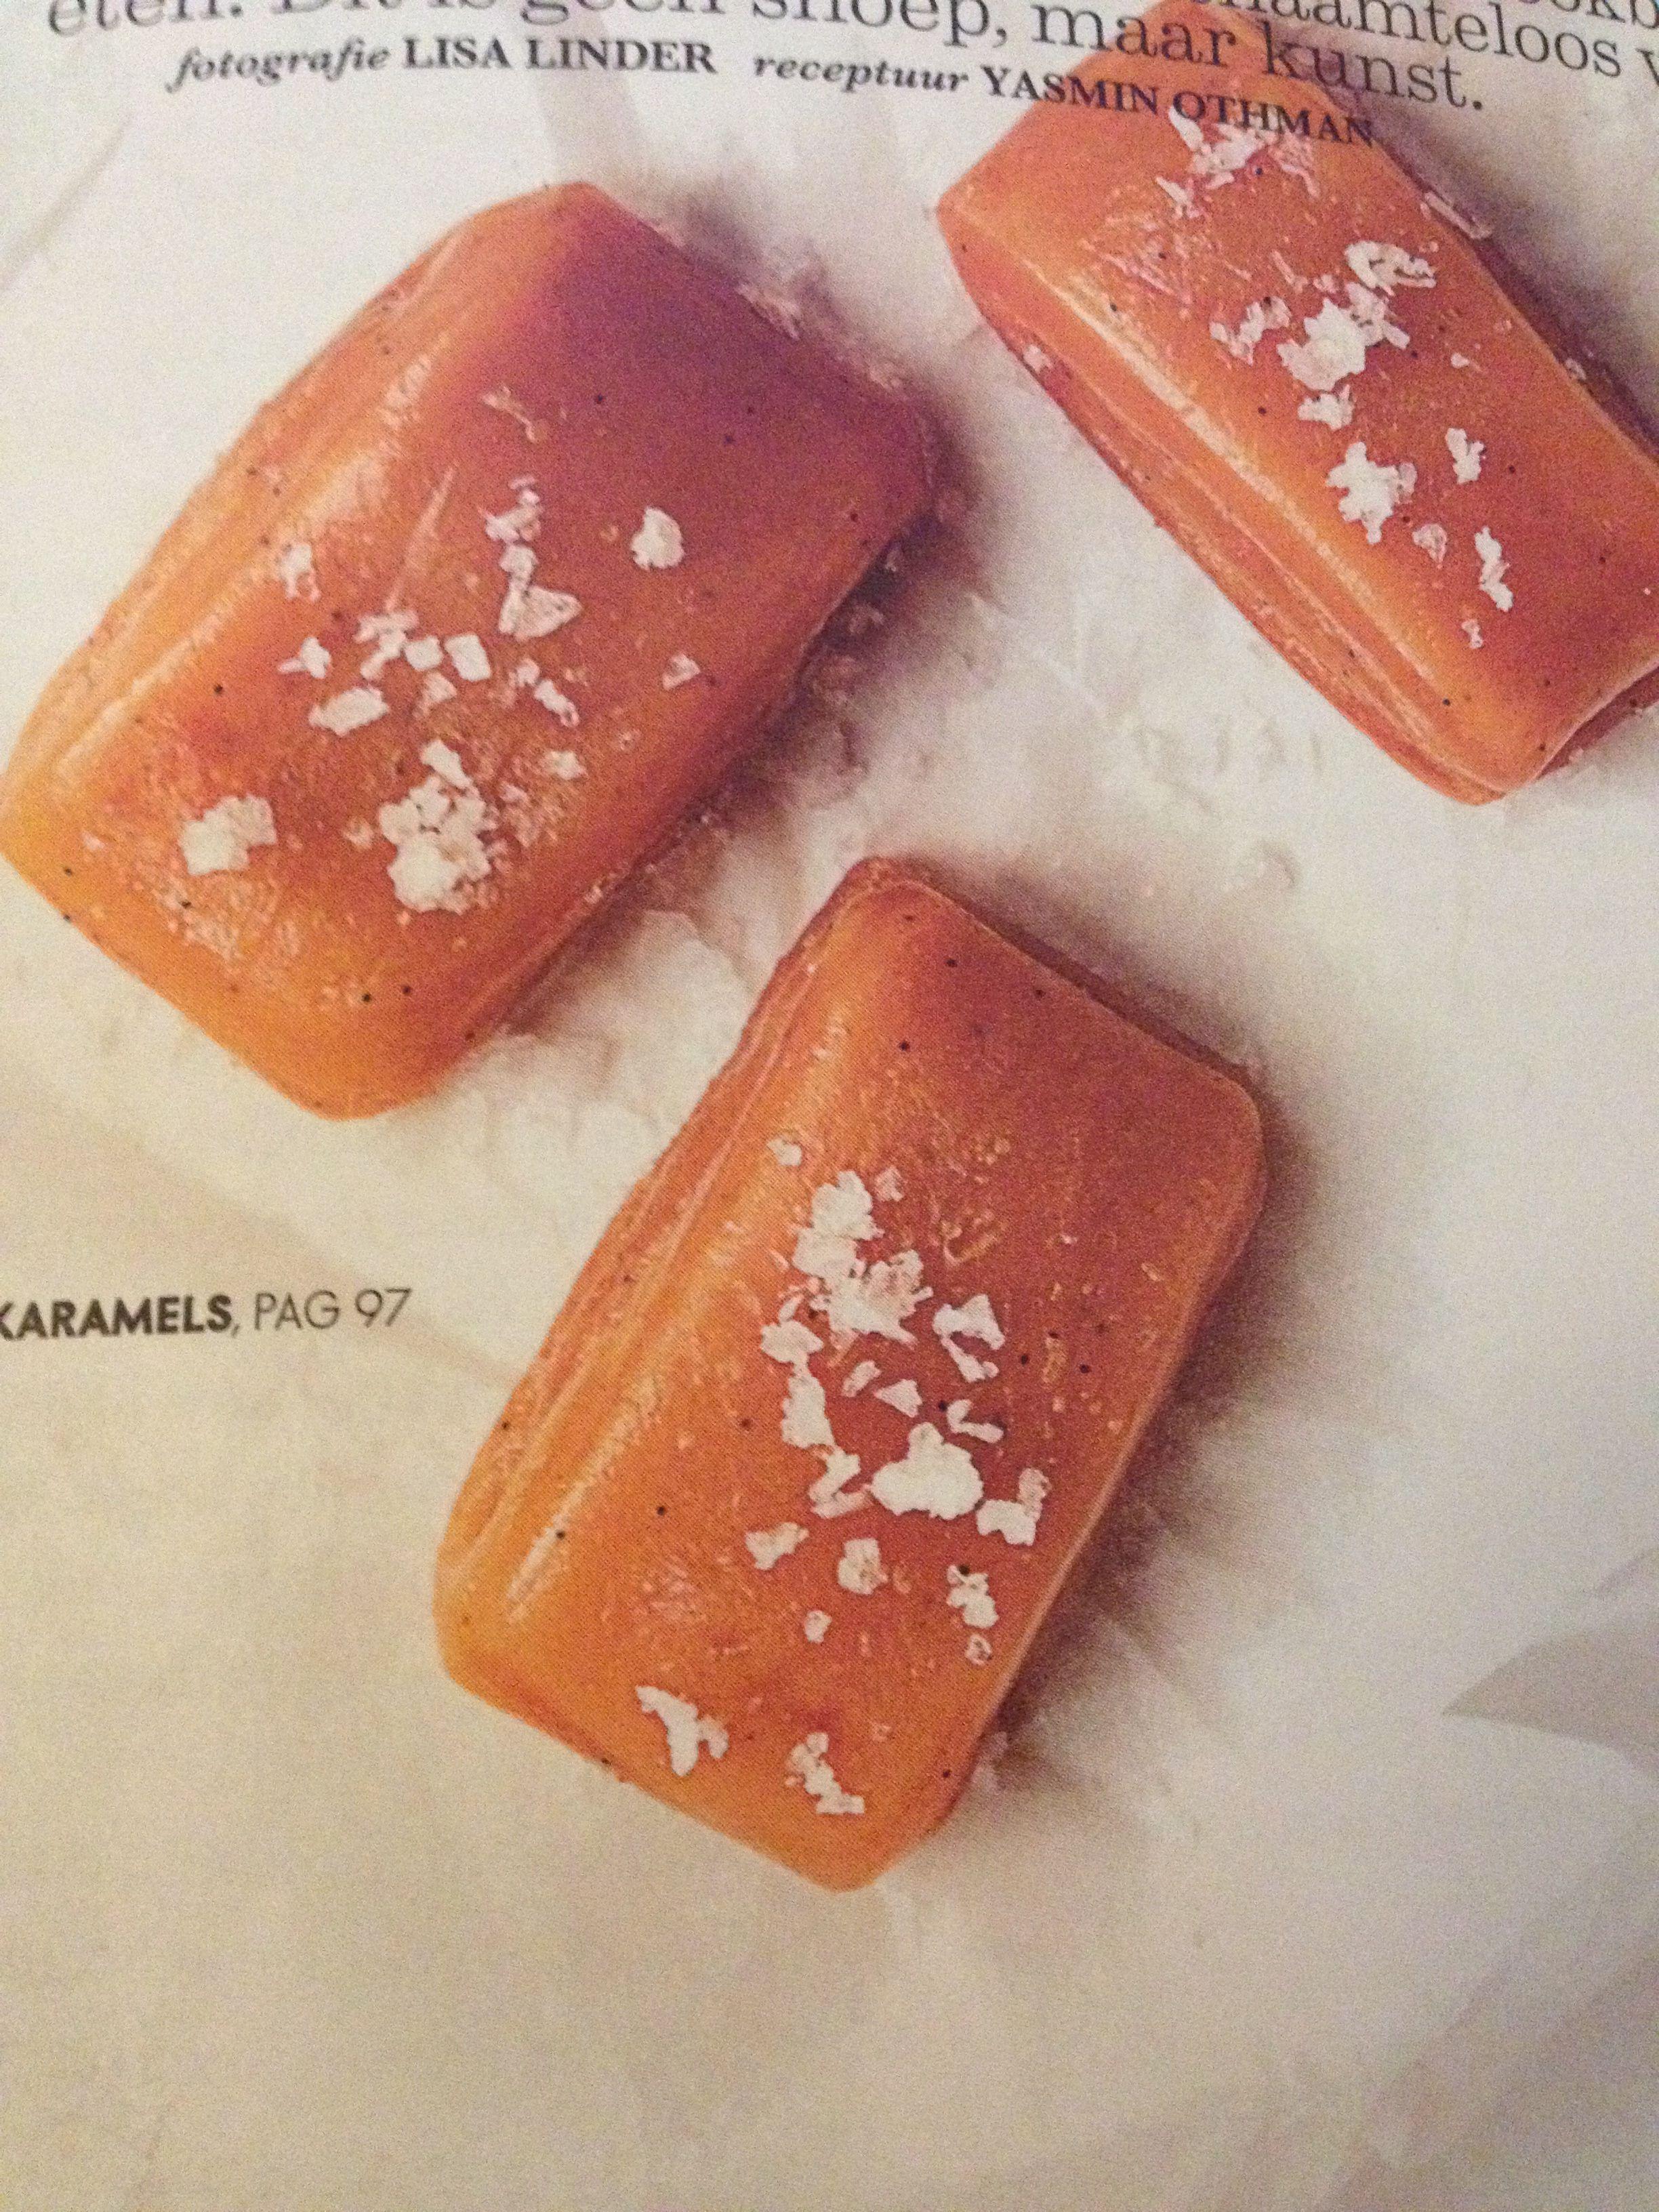 Zoute karamels. Elle Eten n01/2015 blz. 97